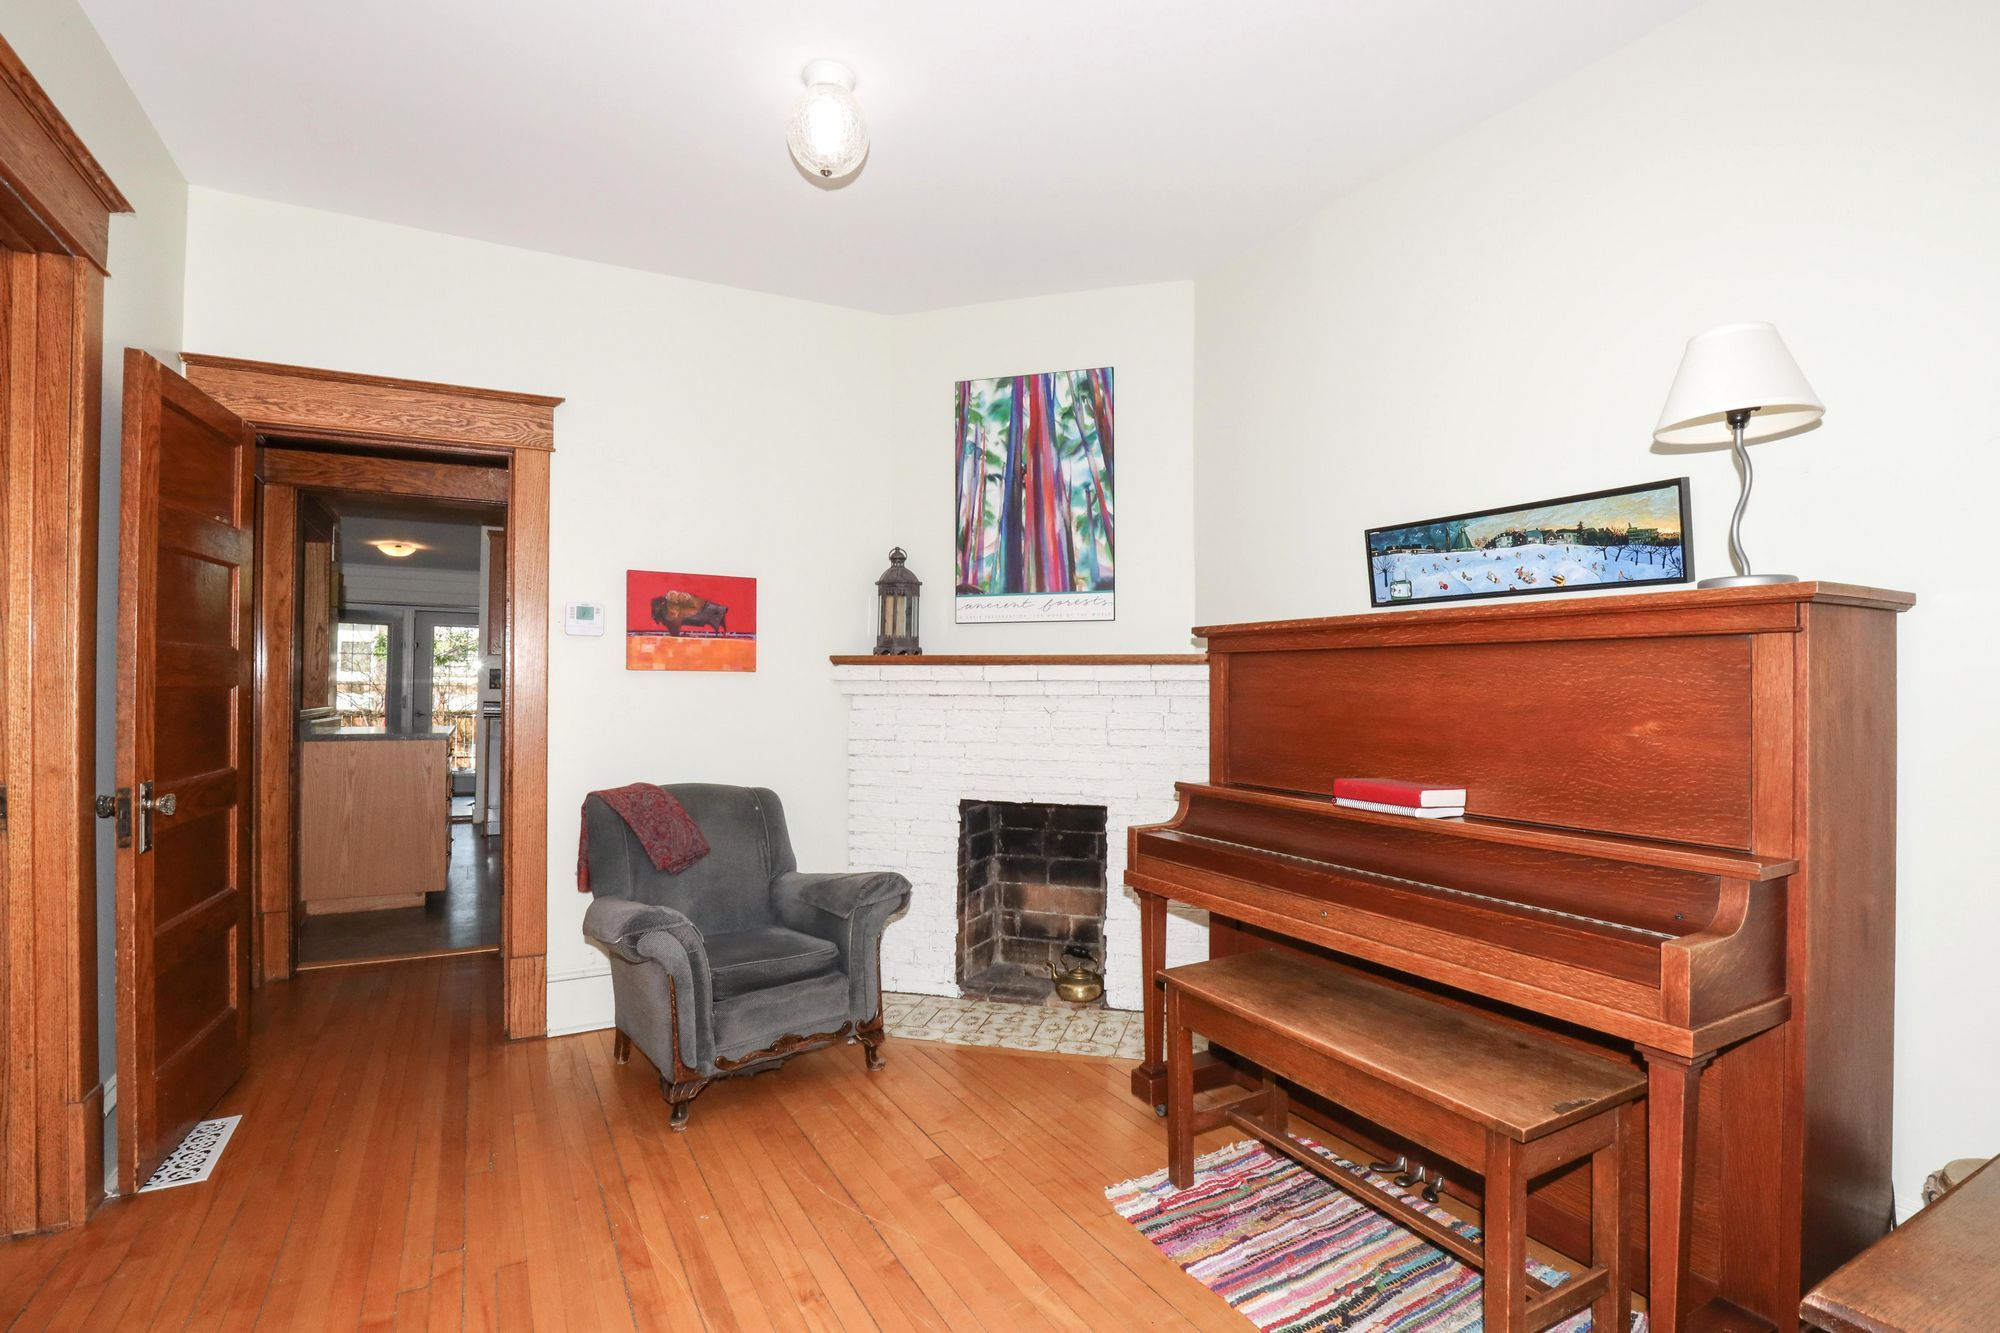 Photo 4: Photos: 110 Lipton in Winnipeg: Wolseley Single Family Detached for sale (5B)  : MLS®# 202111593